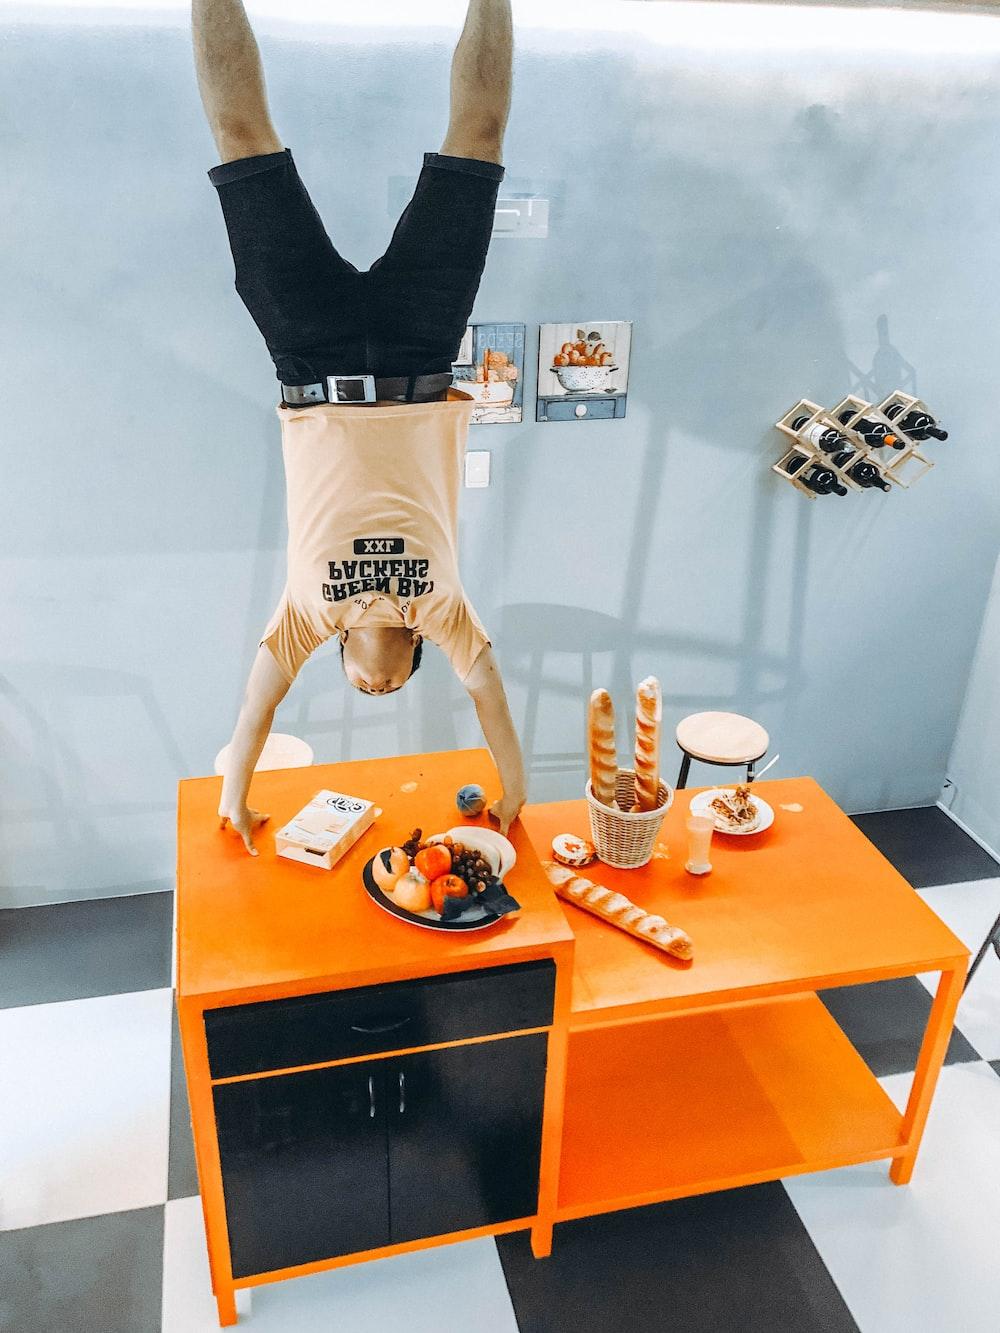 man standing upside down in orange and black cabinet